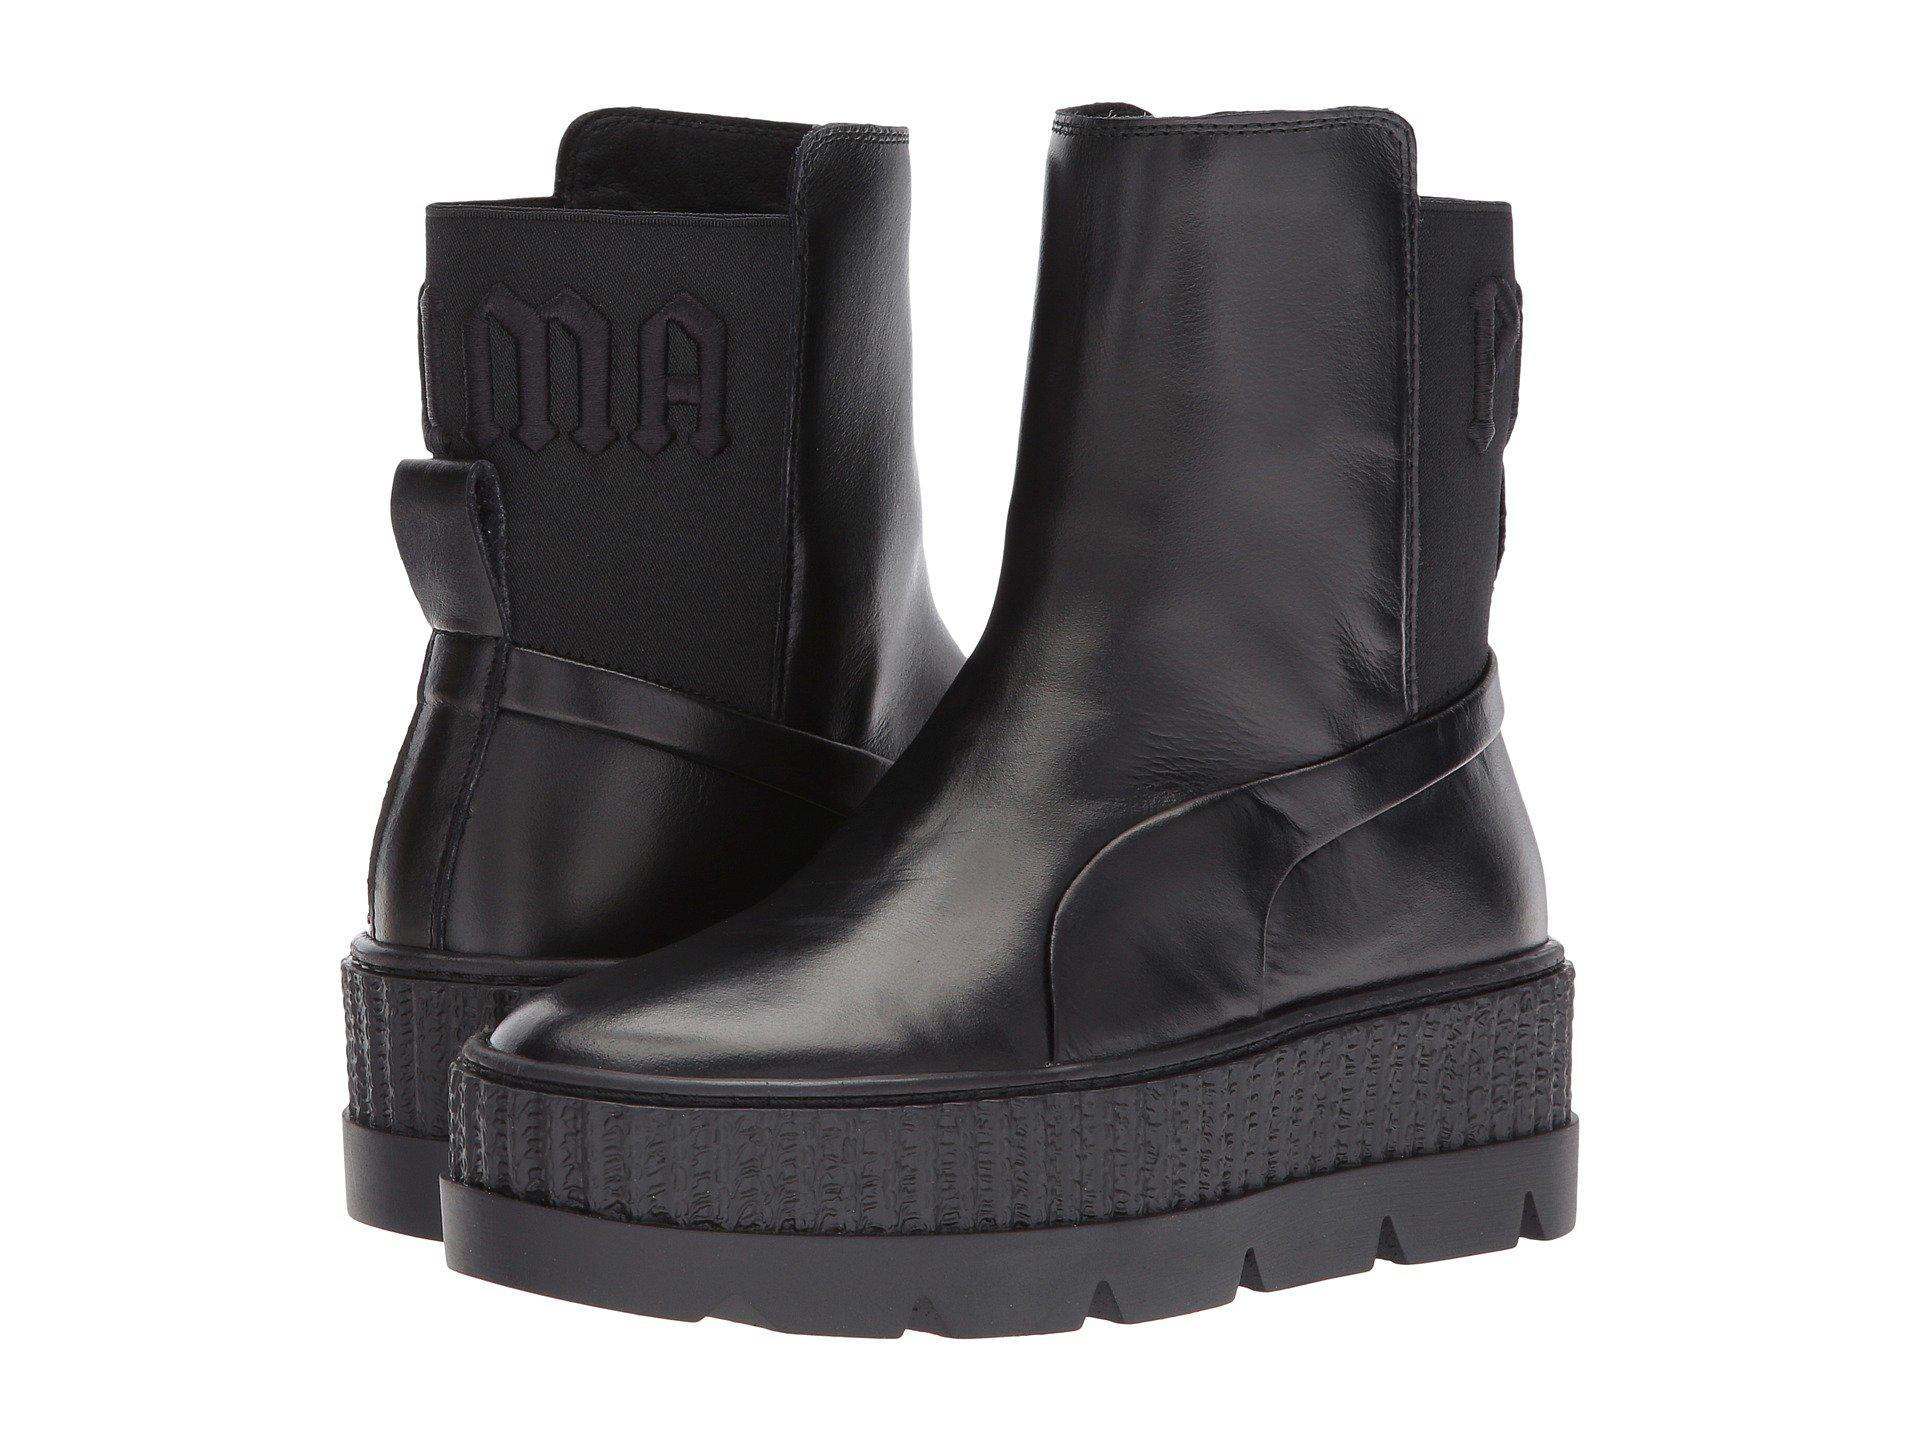 f45a1db4007 Lyst - PUMA X Fenty By Rihanna Chelsea Sneaker Boot in Black for Men